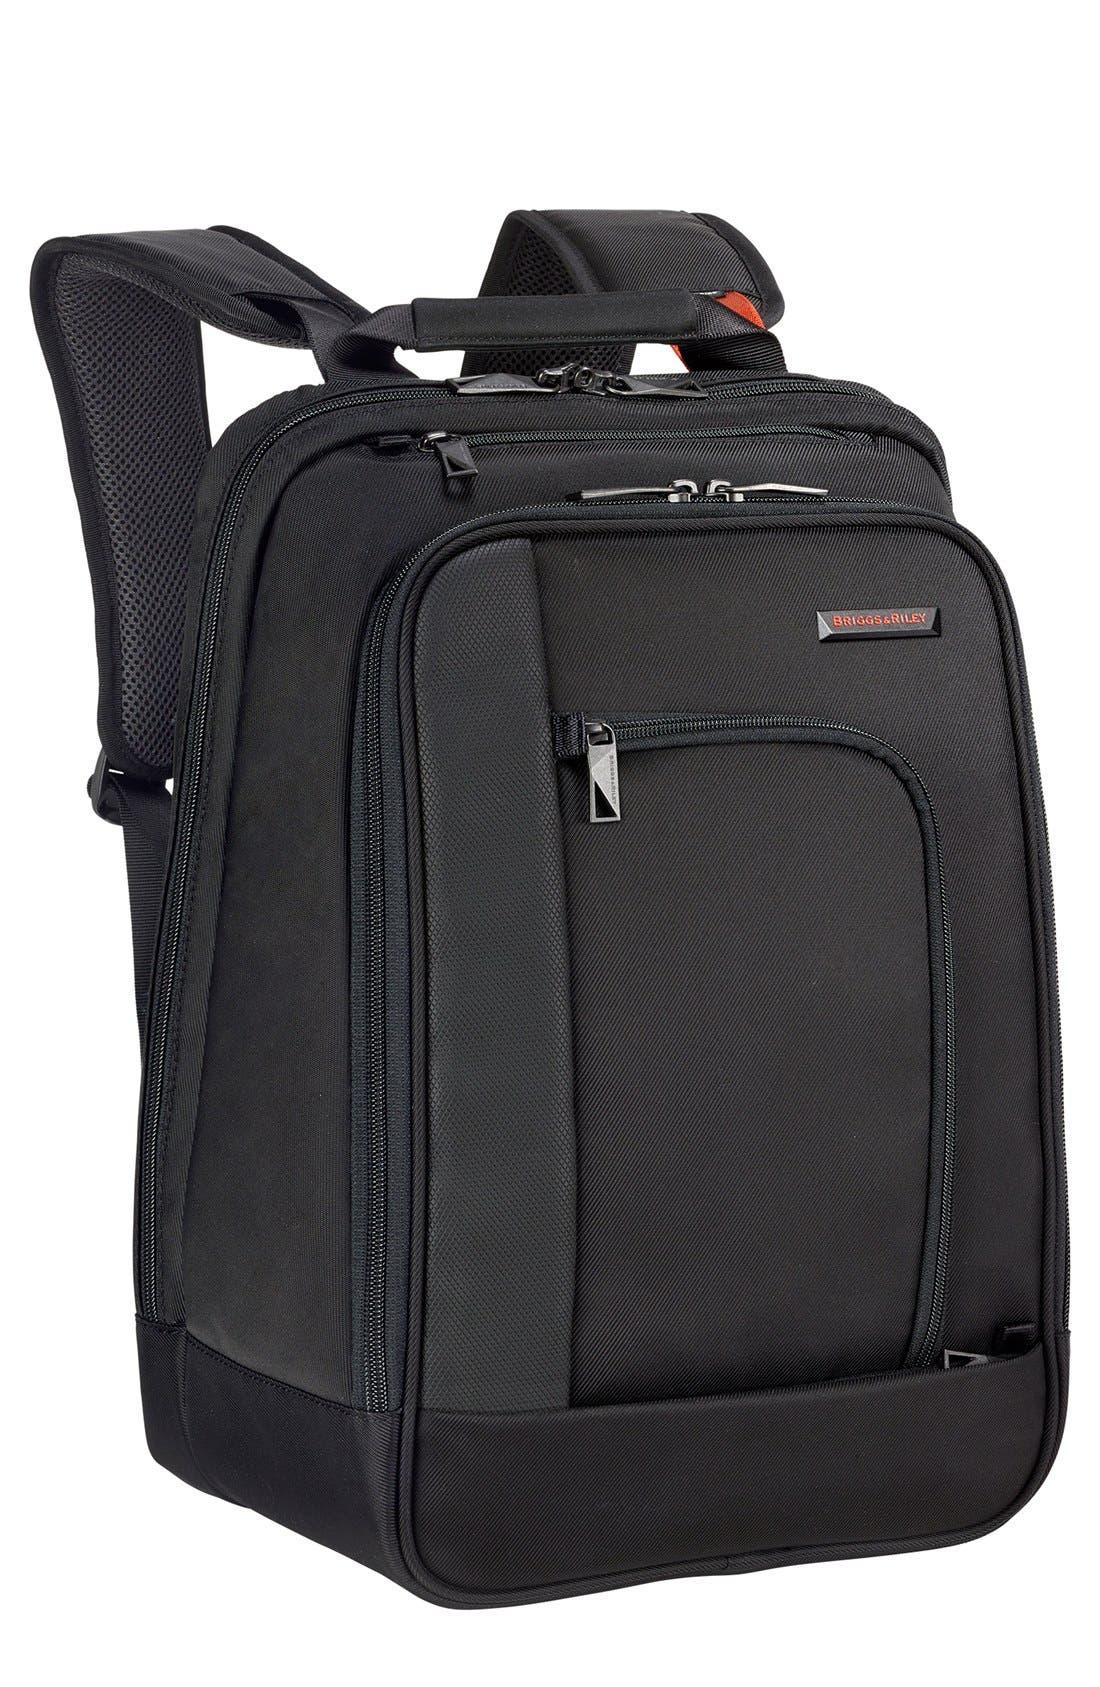 Briggs & Riley 'Verb - Activate' Backpack